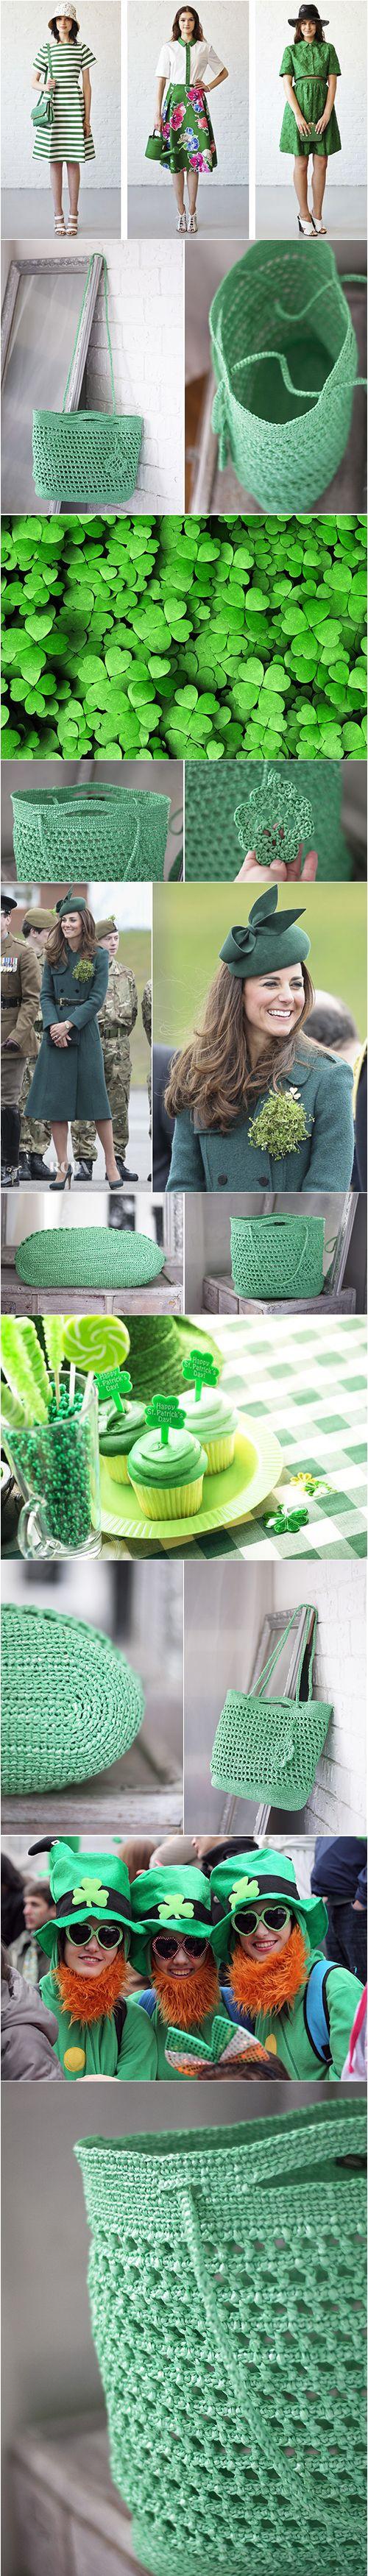 Spring Fashion, Green Bag, St Patricks Day Large Eco Upcycled Bag, Crochet Handbag Big, Lightweight Grass Tote, Summer Spring Beach Plarn Bag, #frombabushkashop, plarn bag